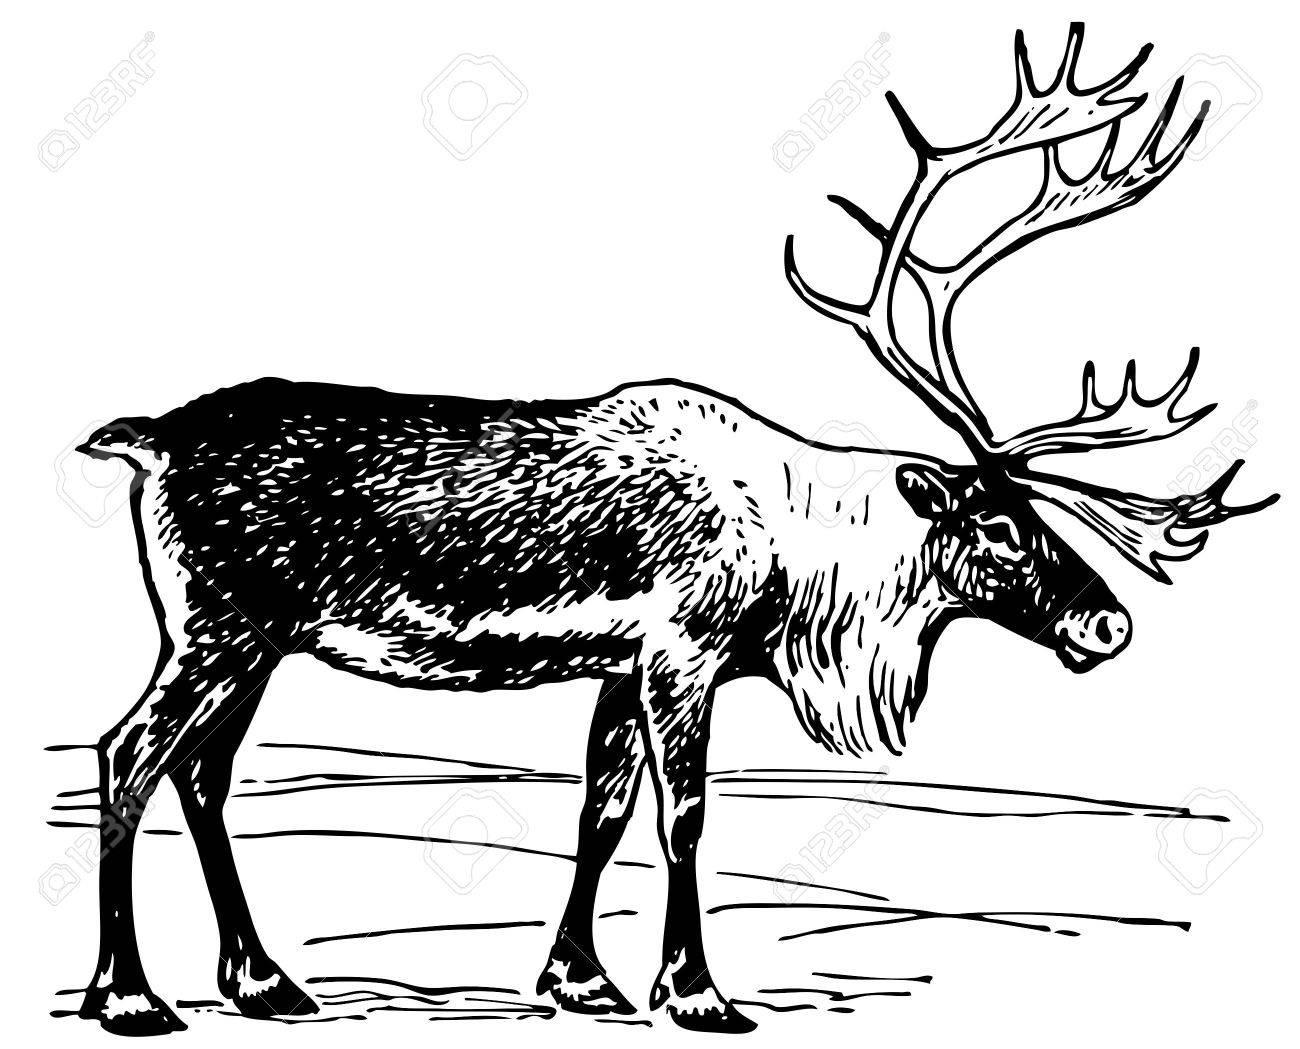 Reindeer - 10402613